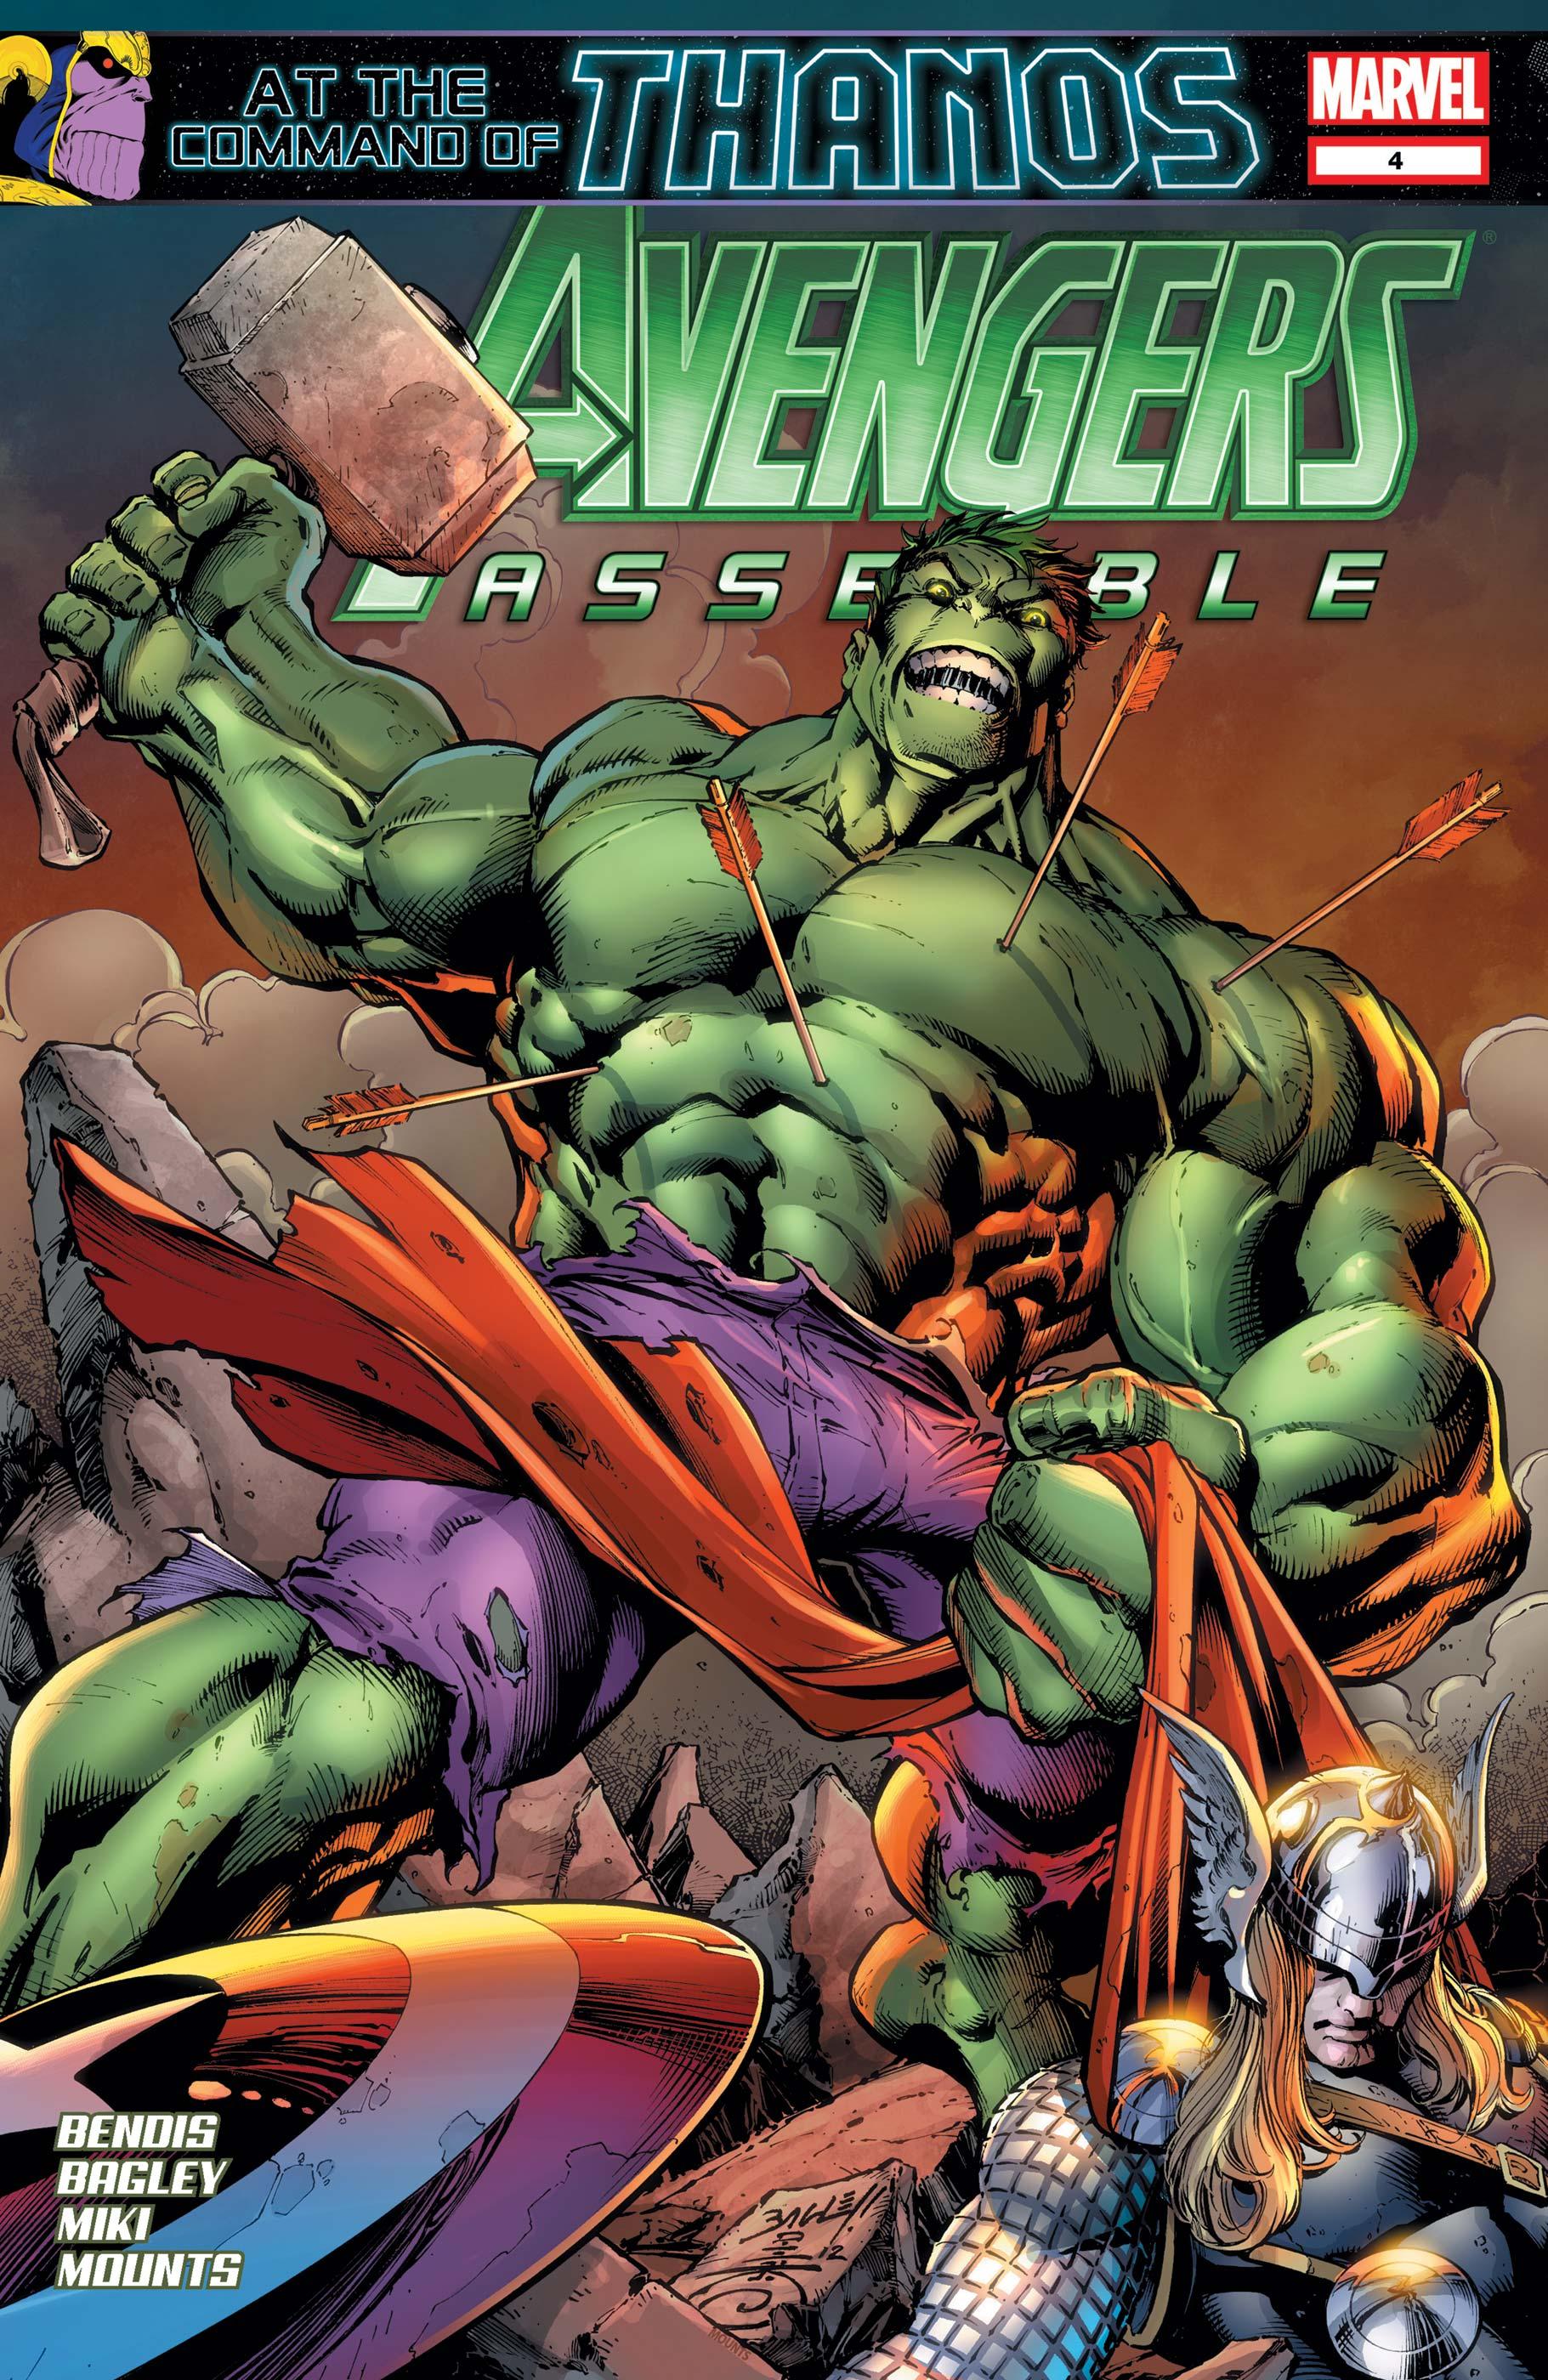 Avengers Assemble (2012) #4